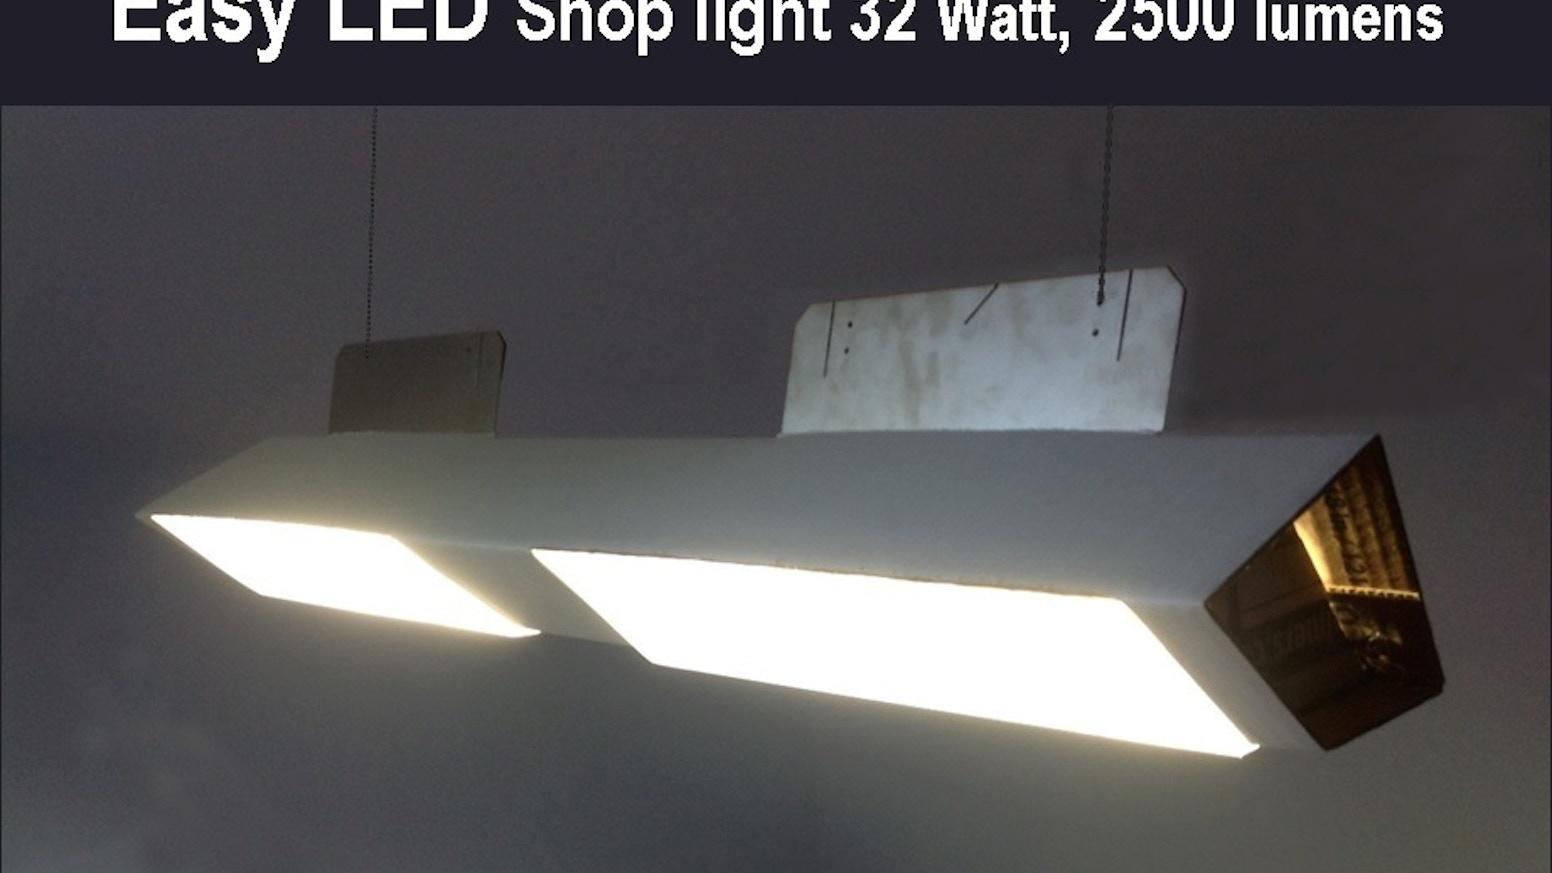 World lamp 32watt led shop light low cost eco friendly